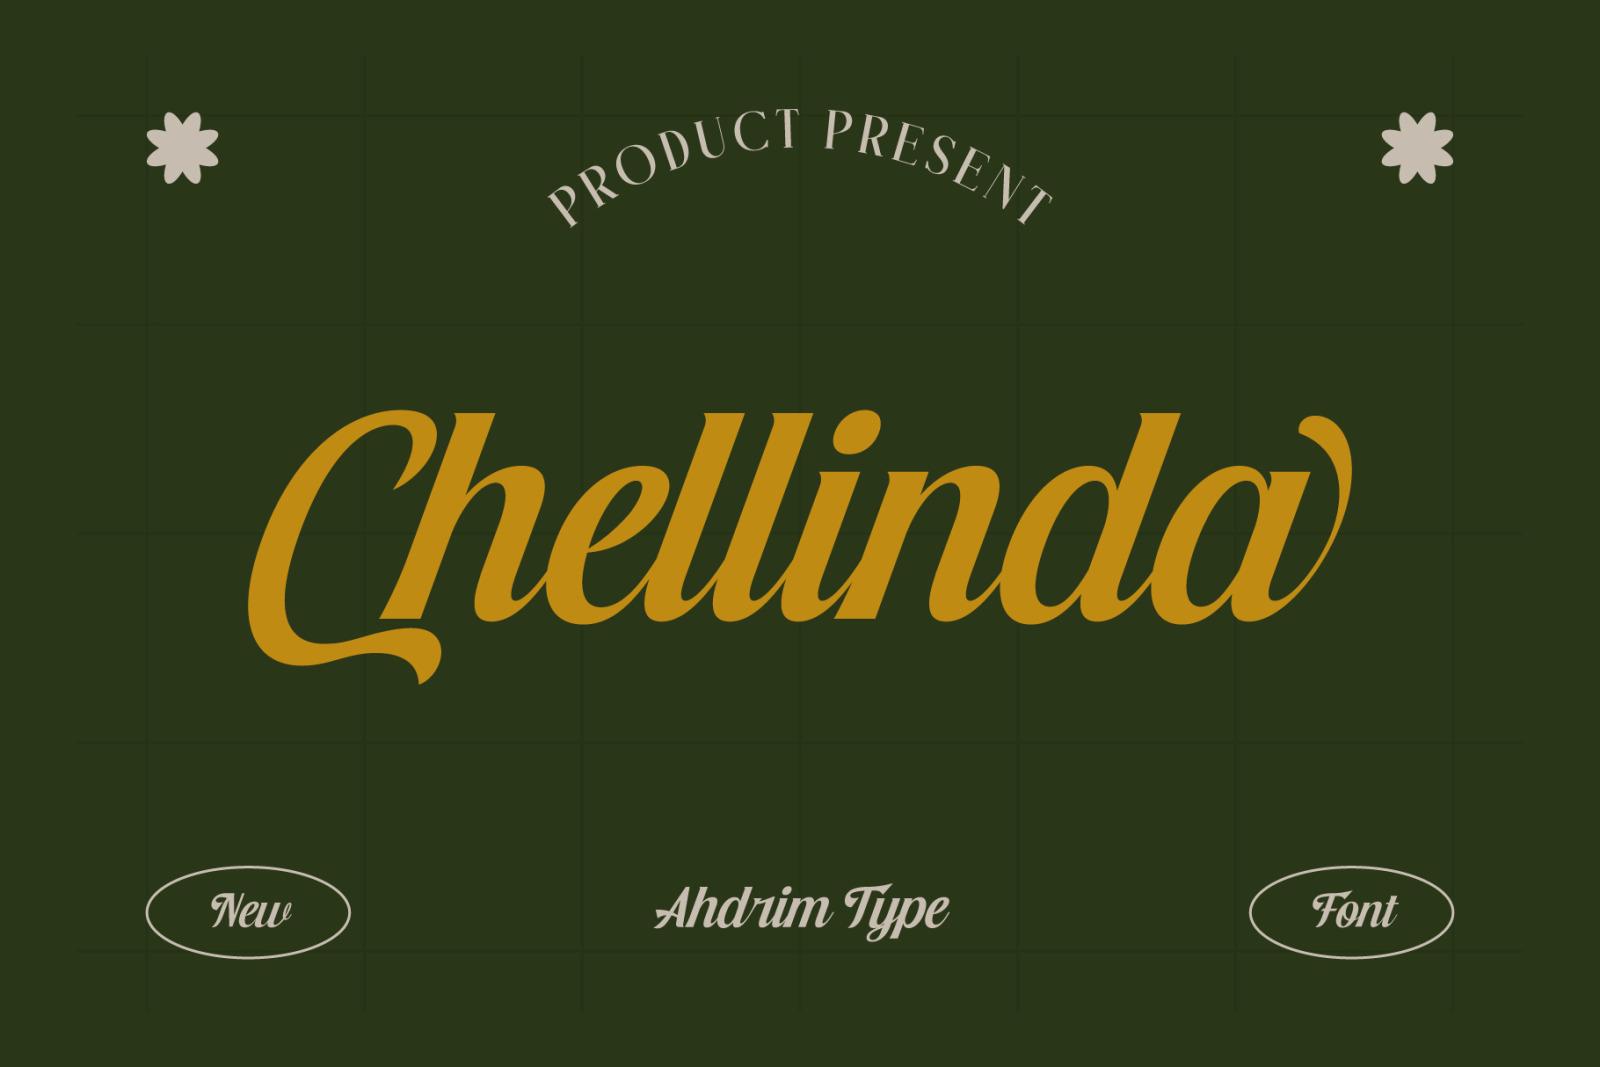 Chellinda Bold Script